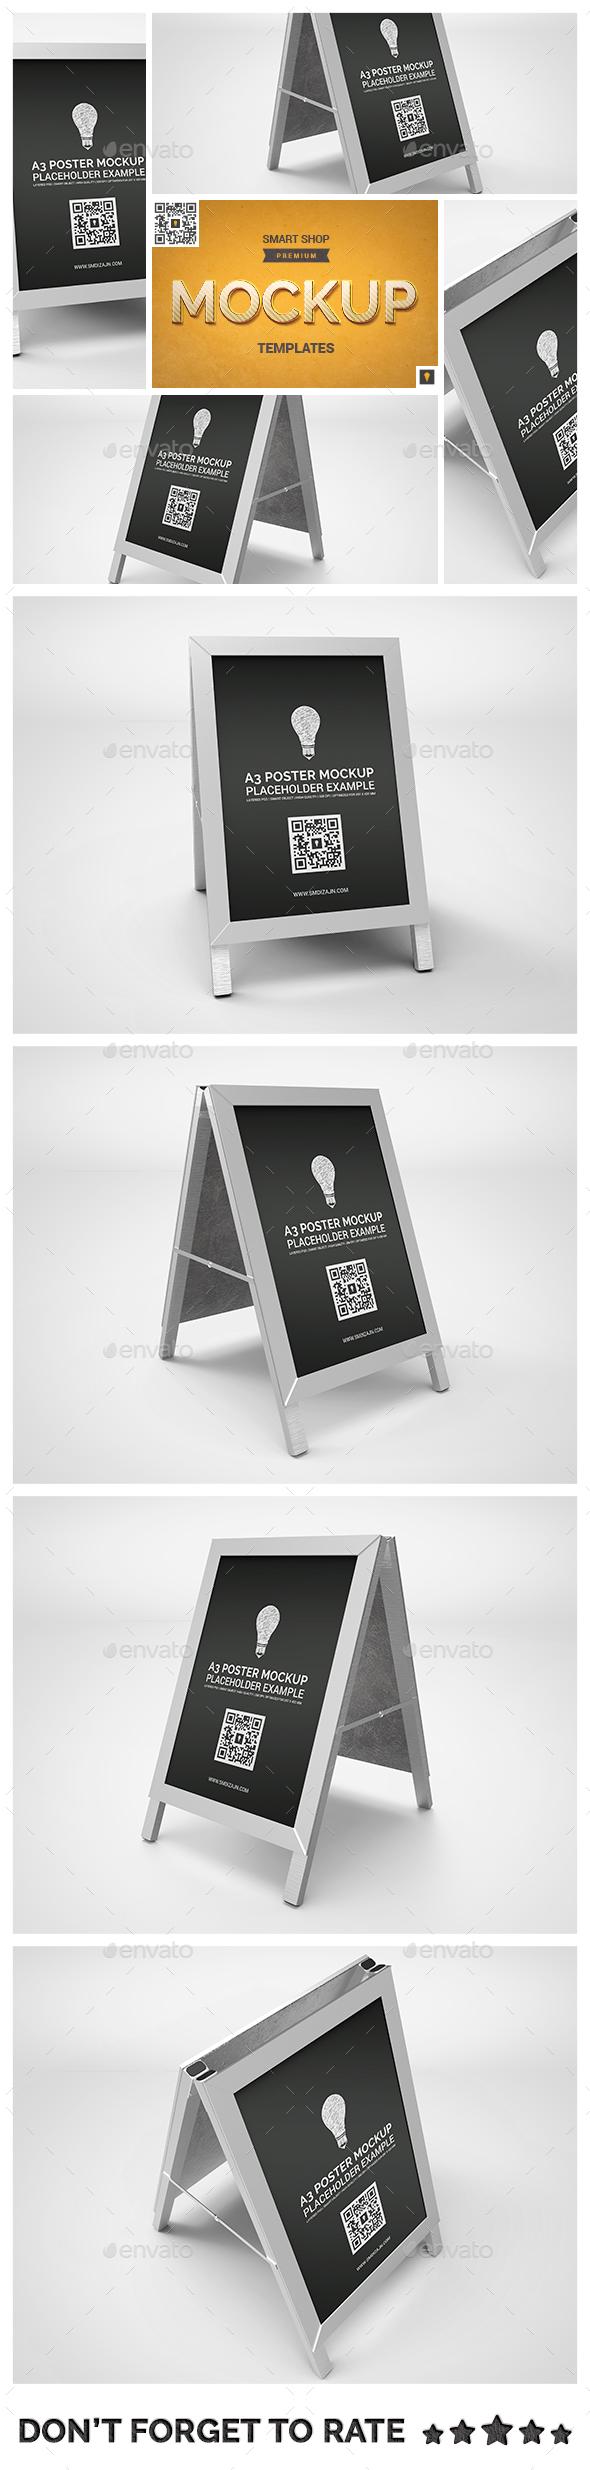 Poster Stand Display Mockup - Signage Print